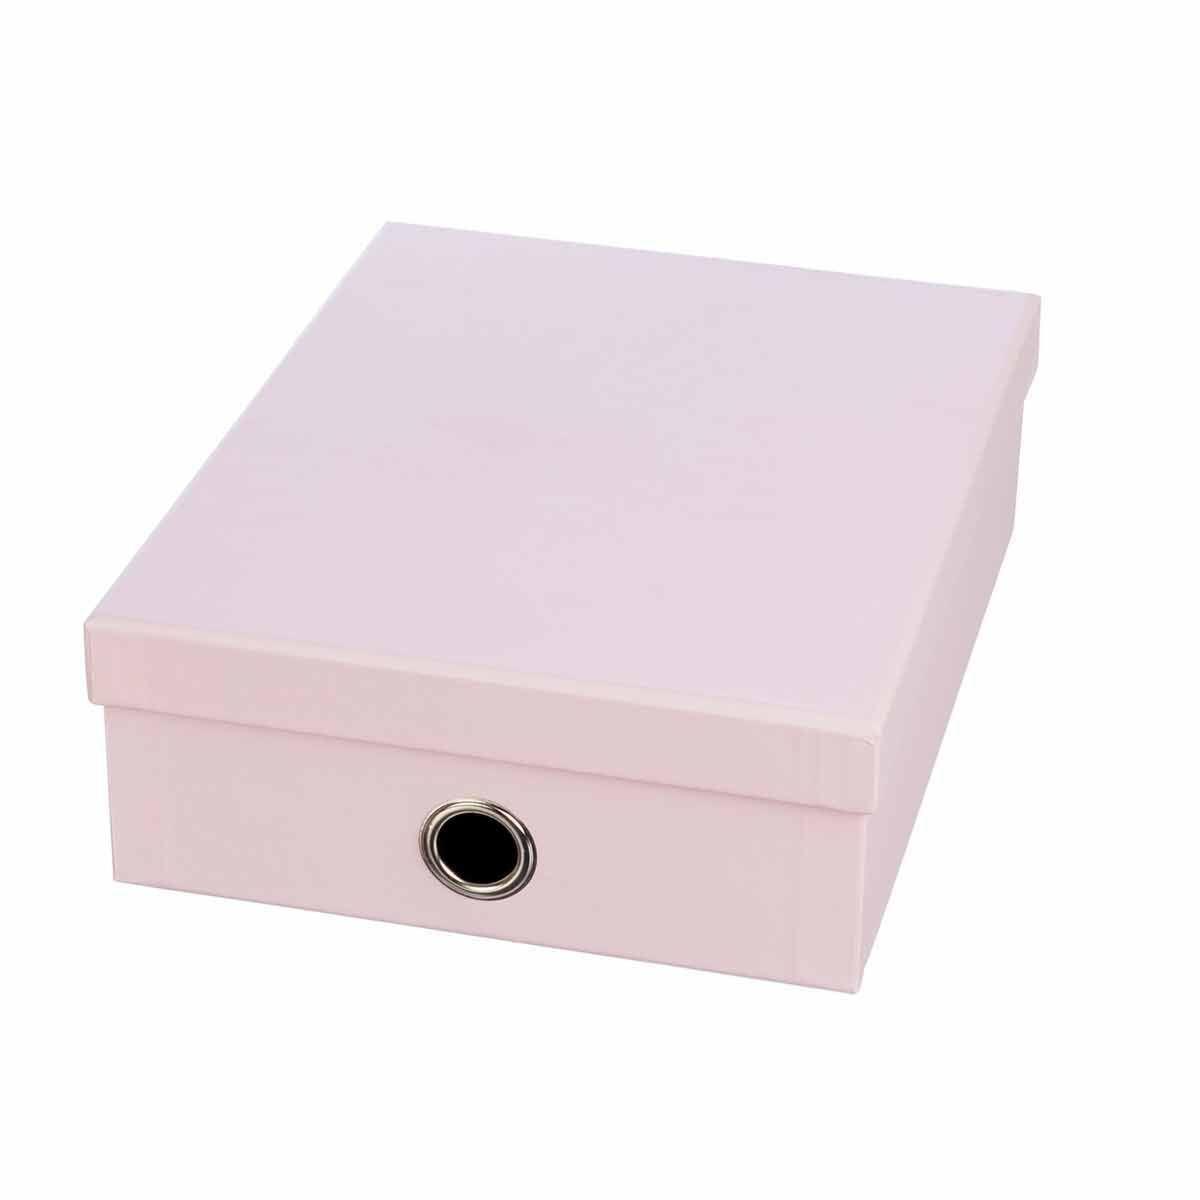 Ryman Storage Box Large Light Pink